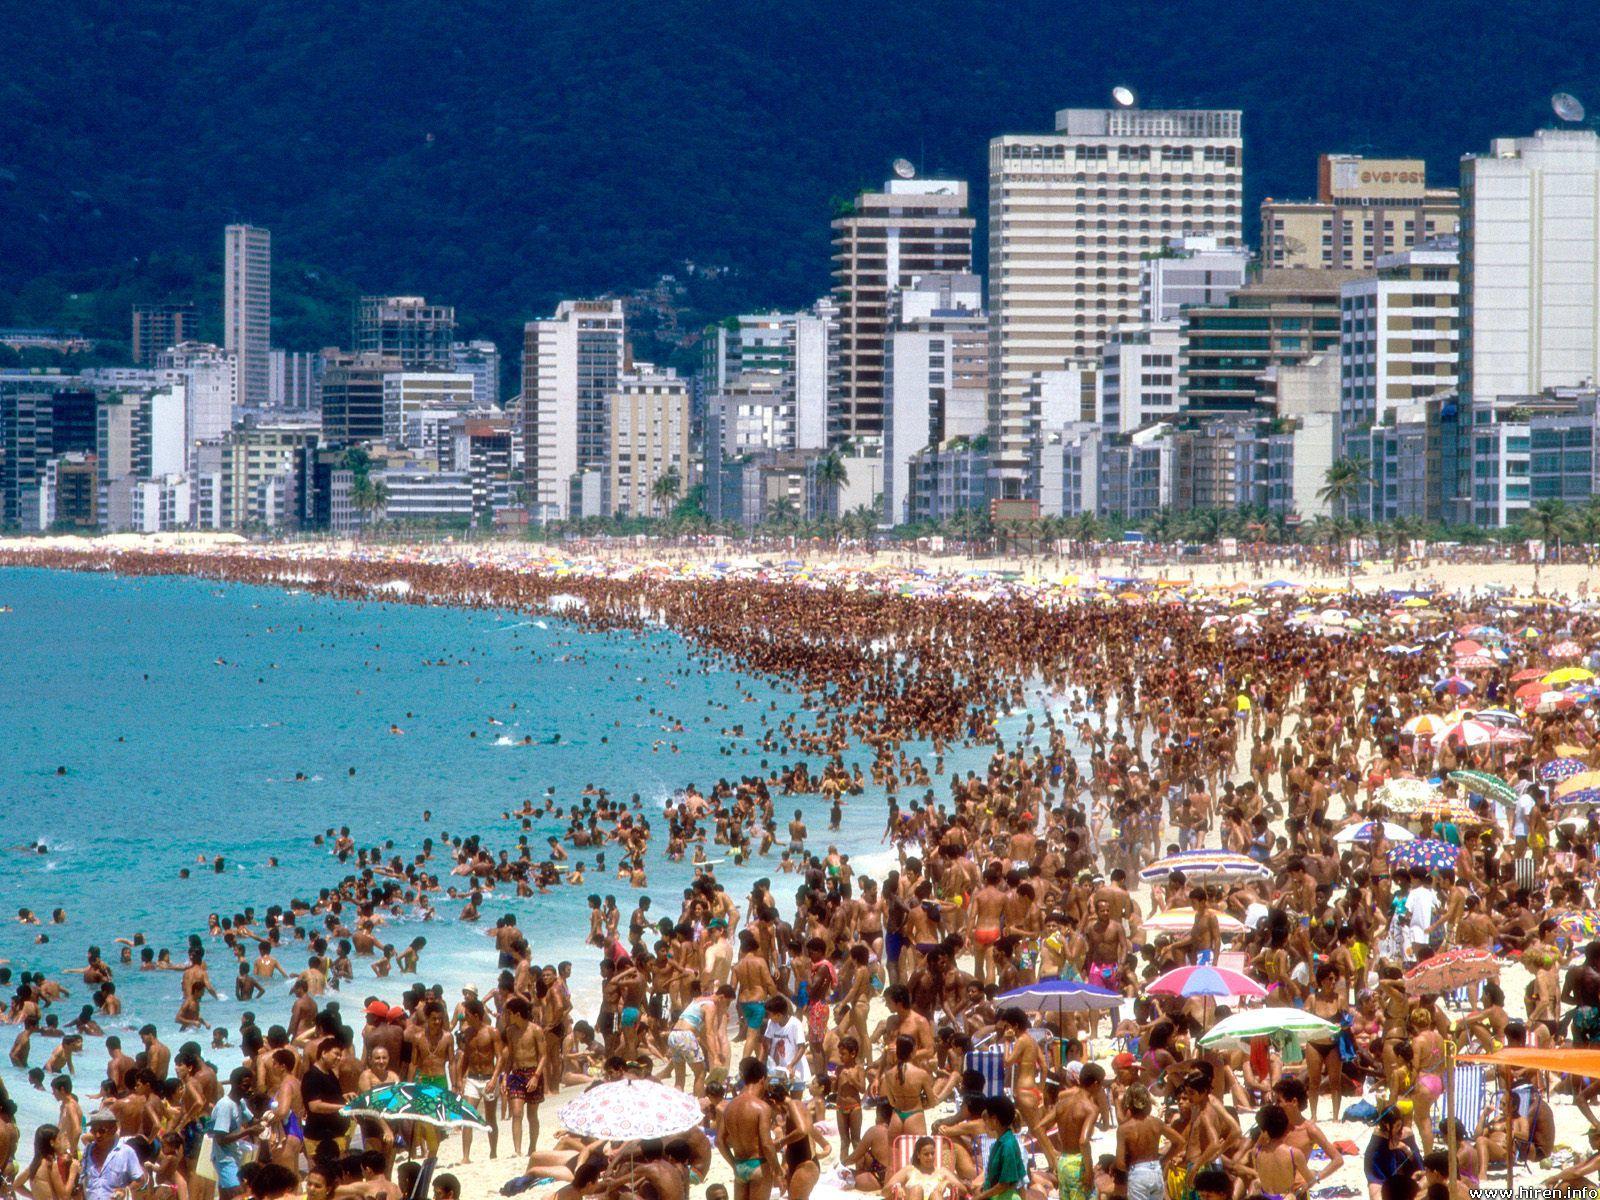 World Most Popular Places Rio de Janeiro Beaches Brazil Wallpapers 1600x1200